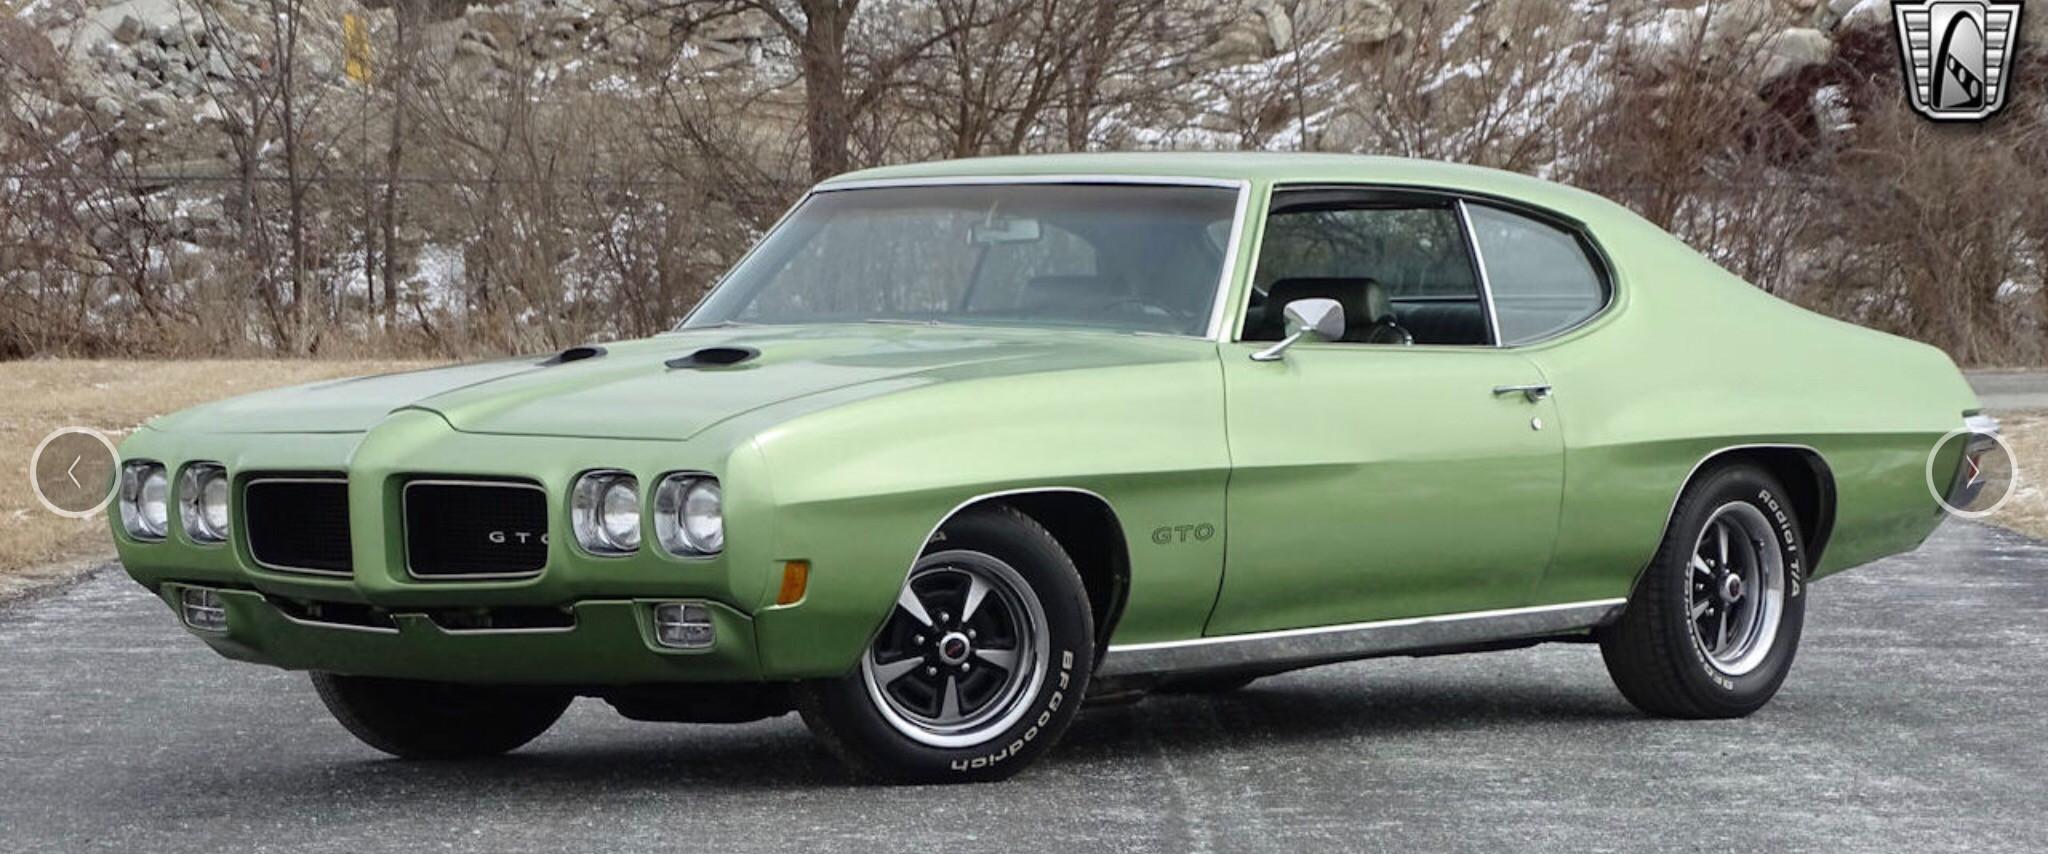 Pontiac  Gto Hire Clewiston